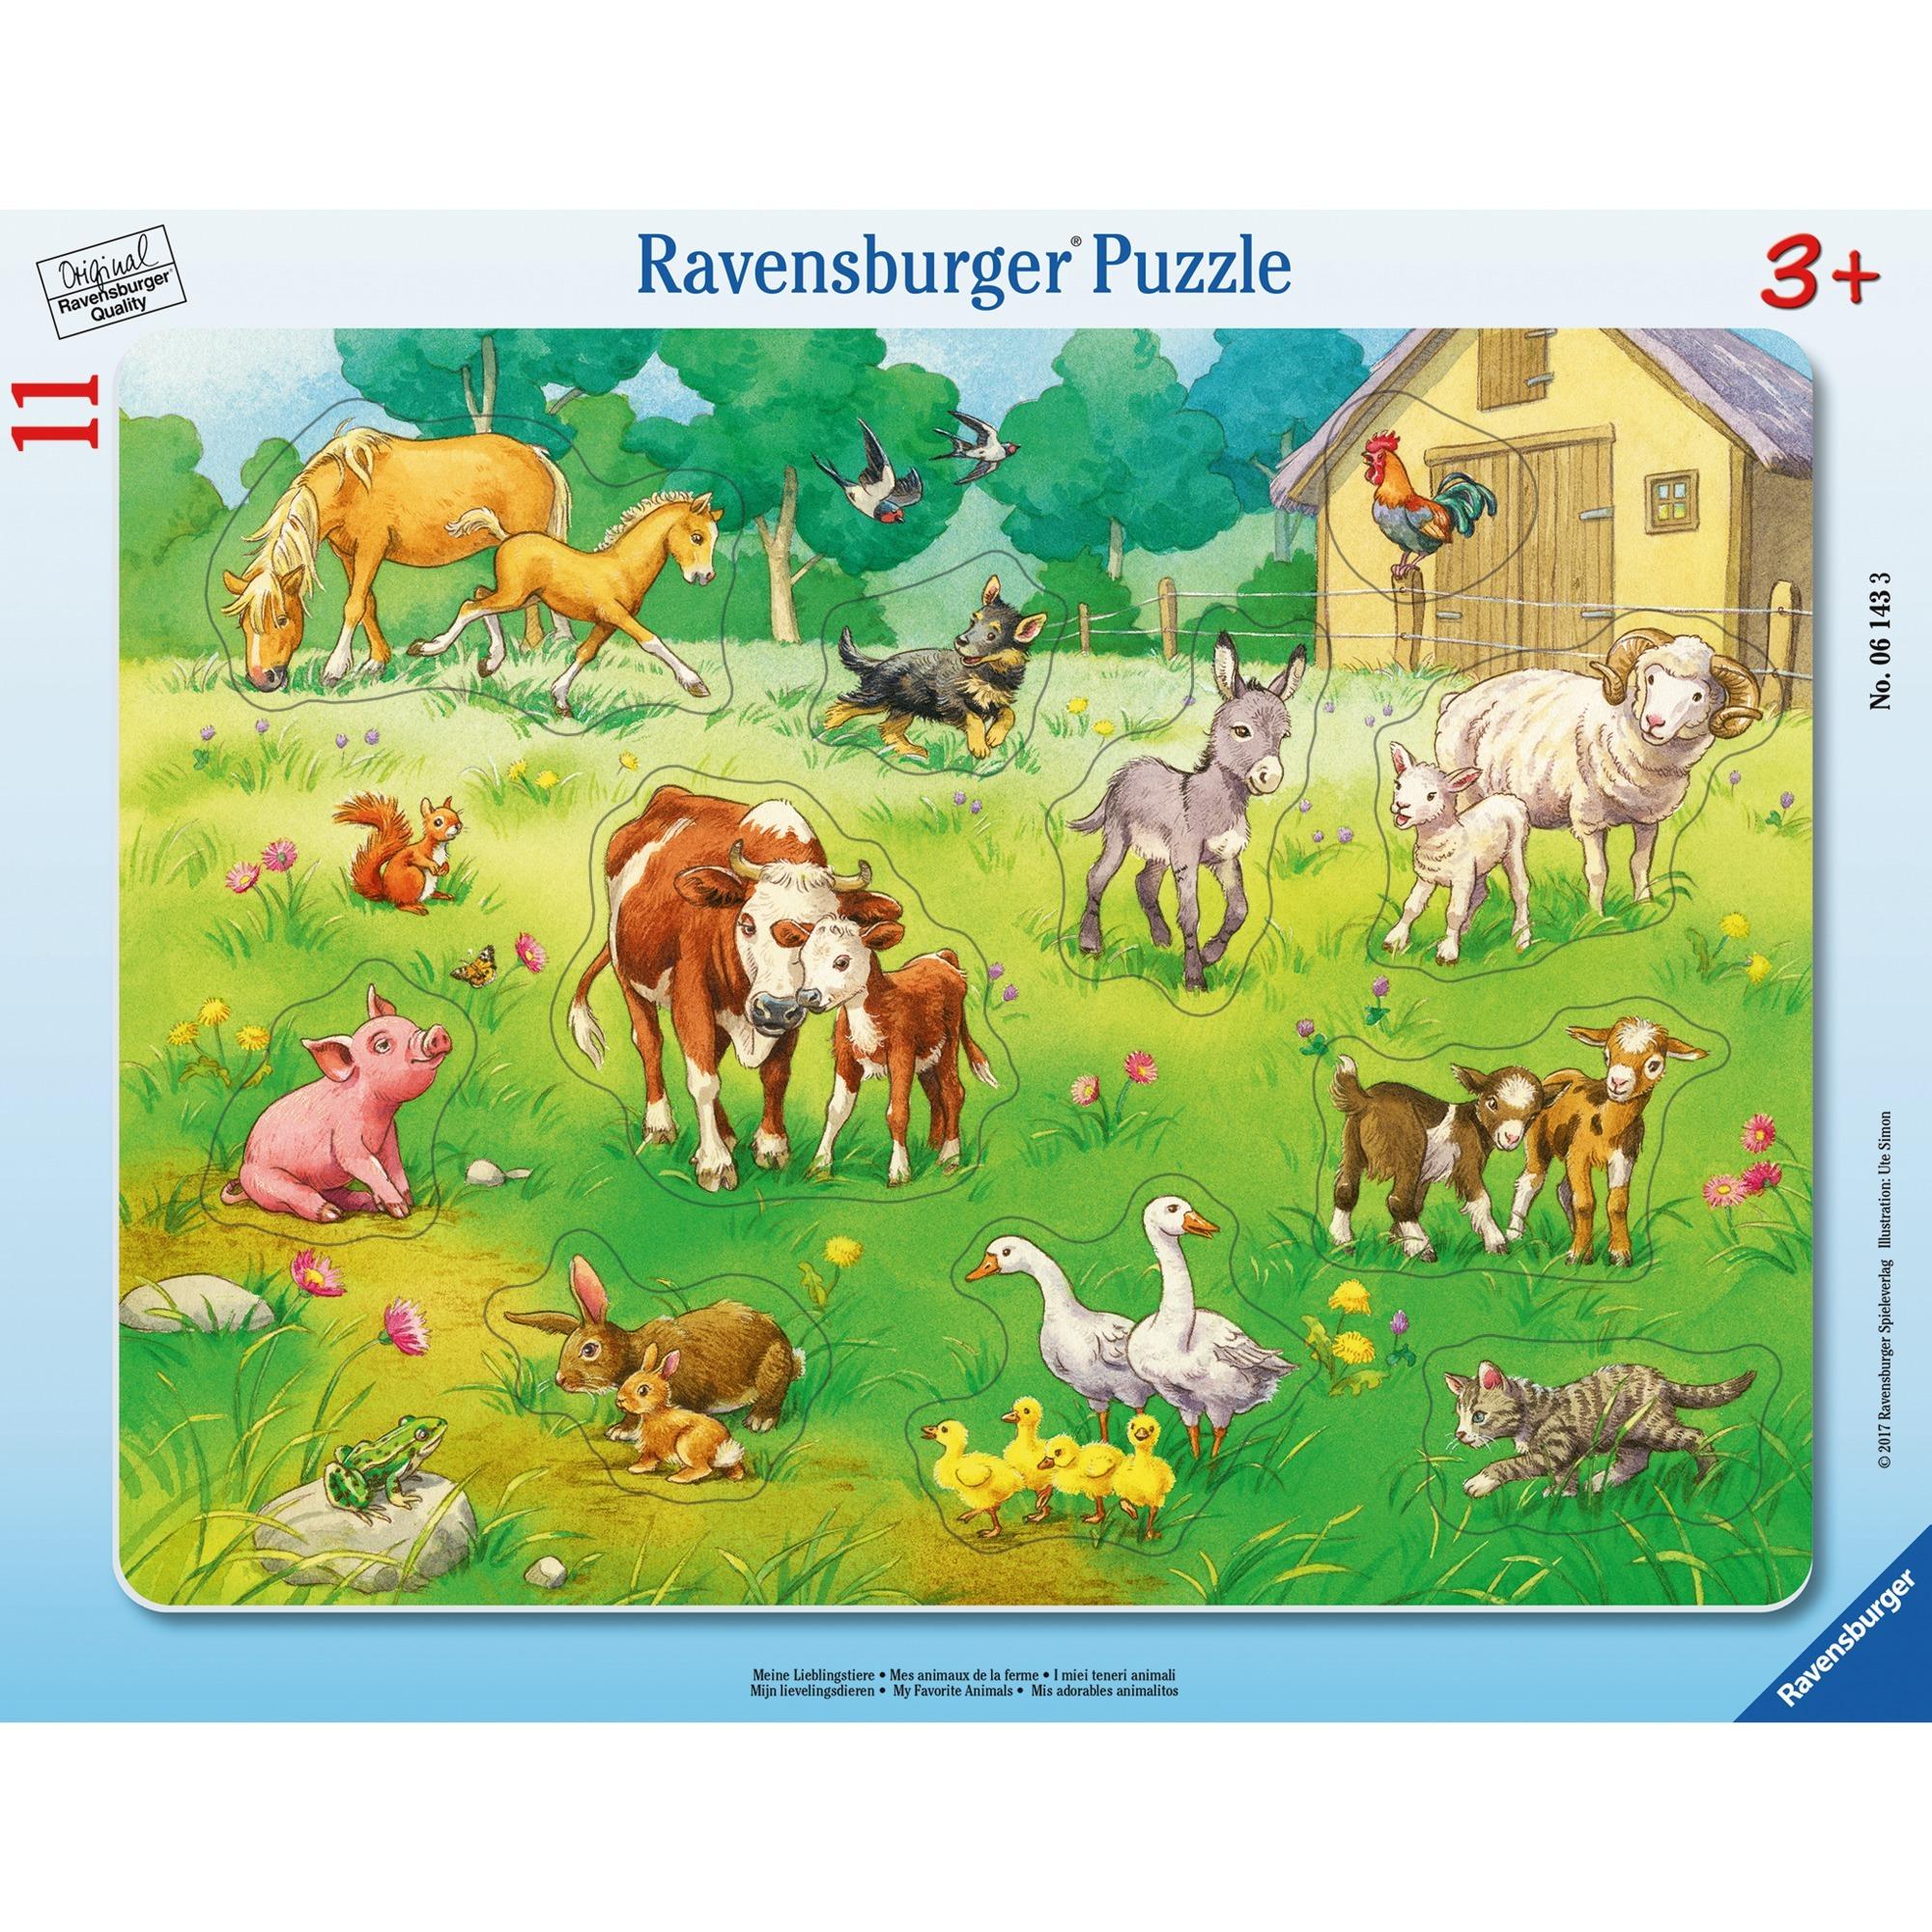 00.006.143 11pieza(s) puzzle